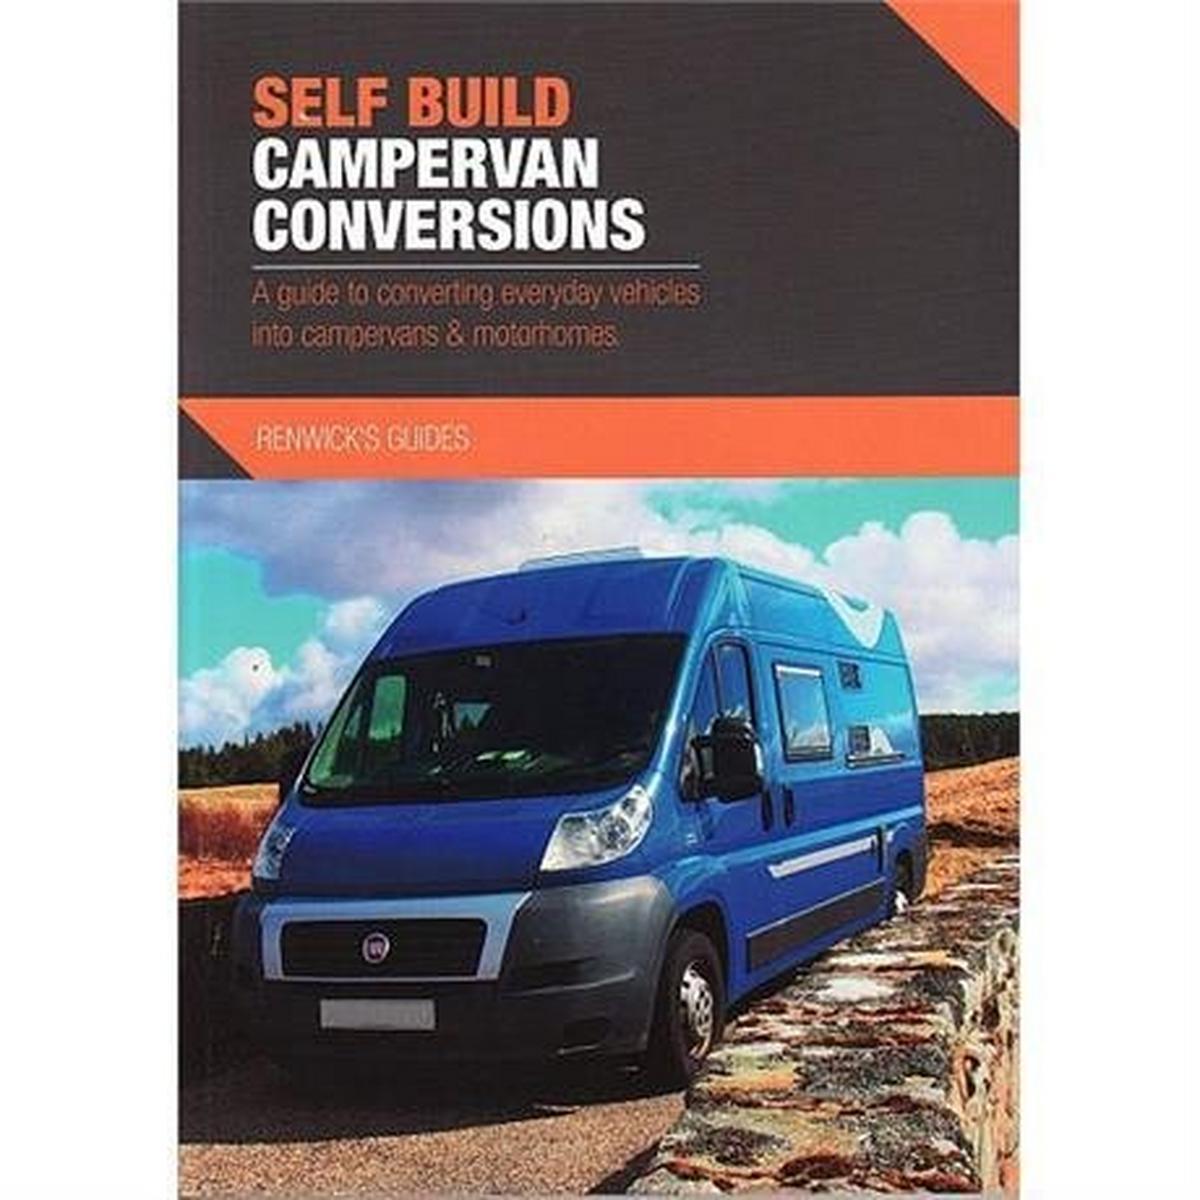 Miscellaneous Book: Self Build Campervan Conversions